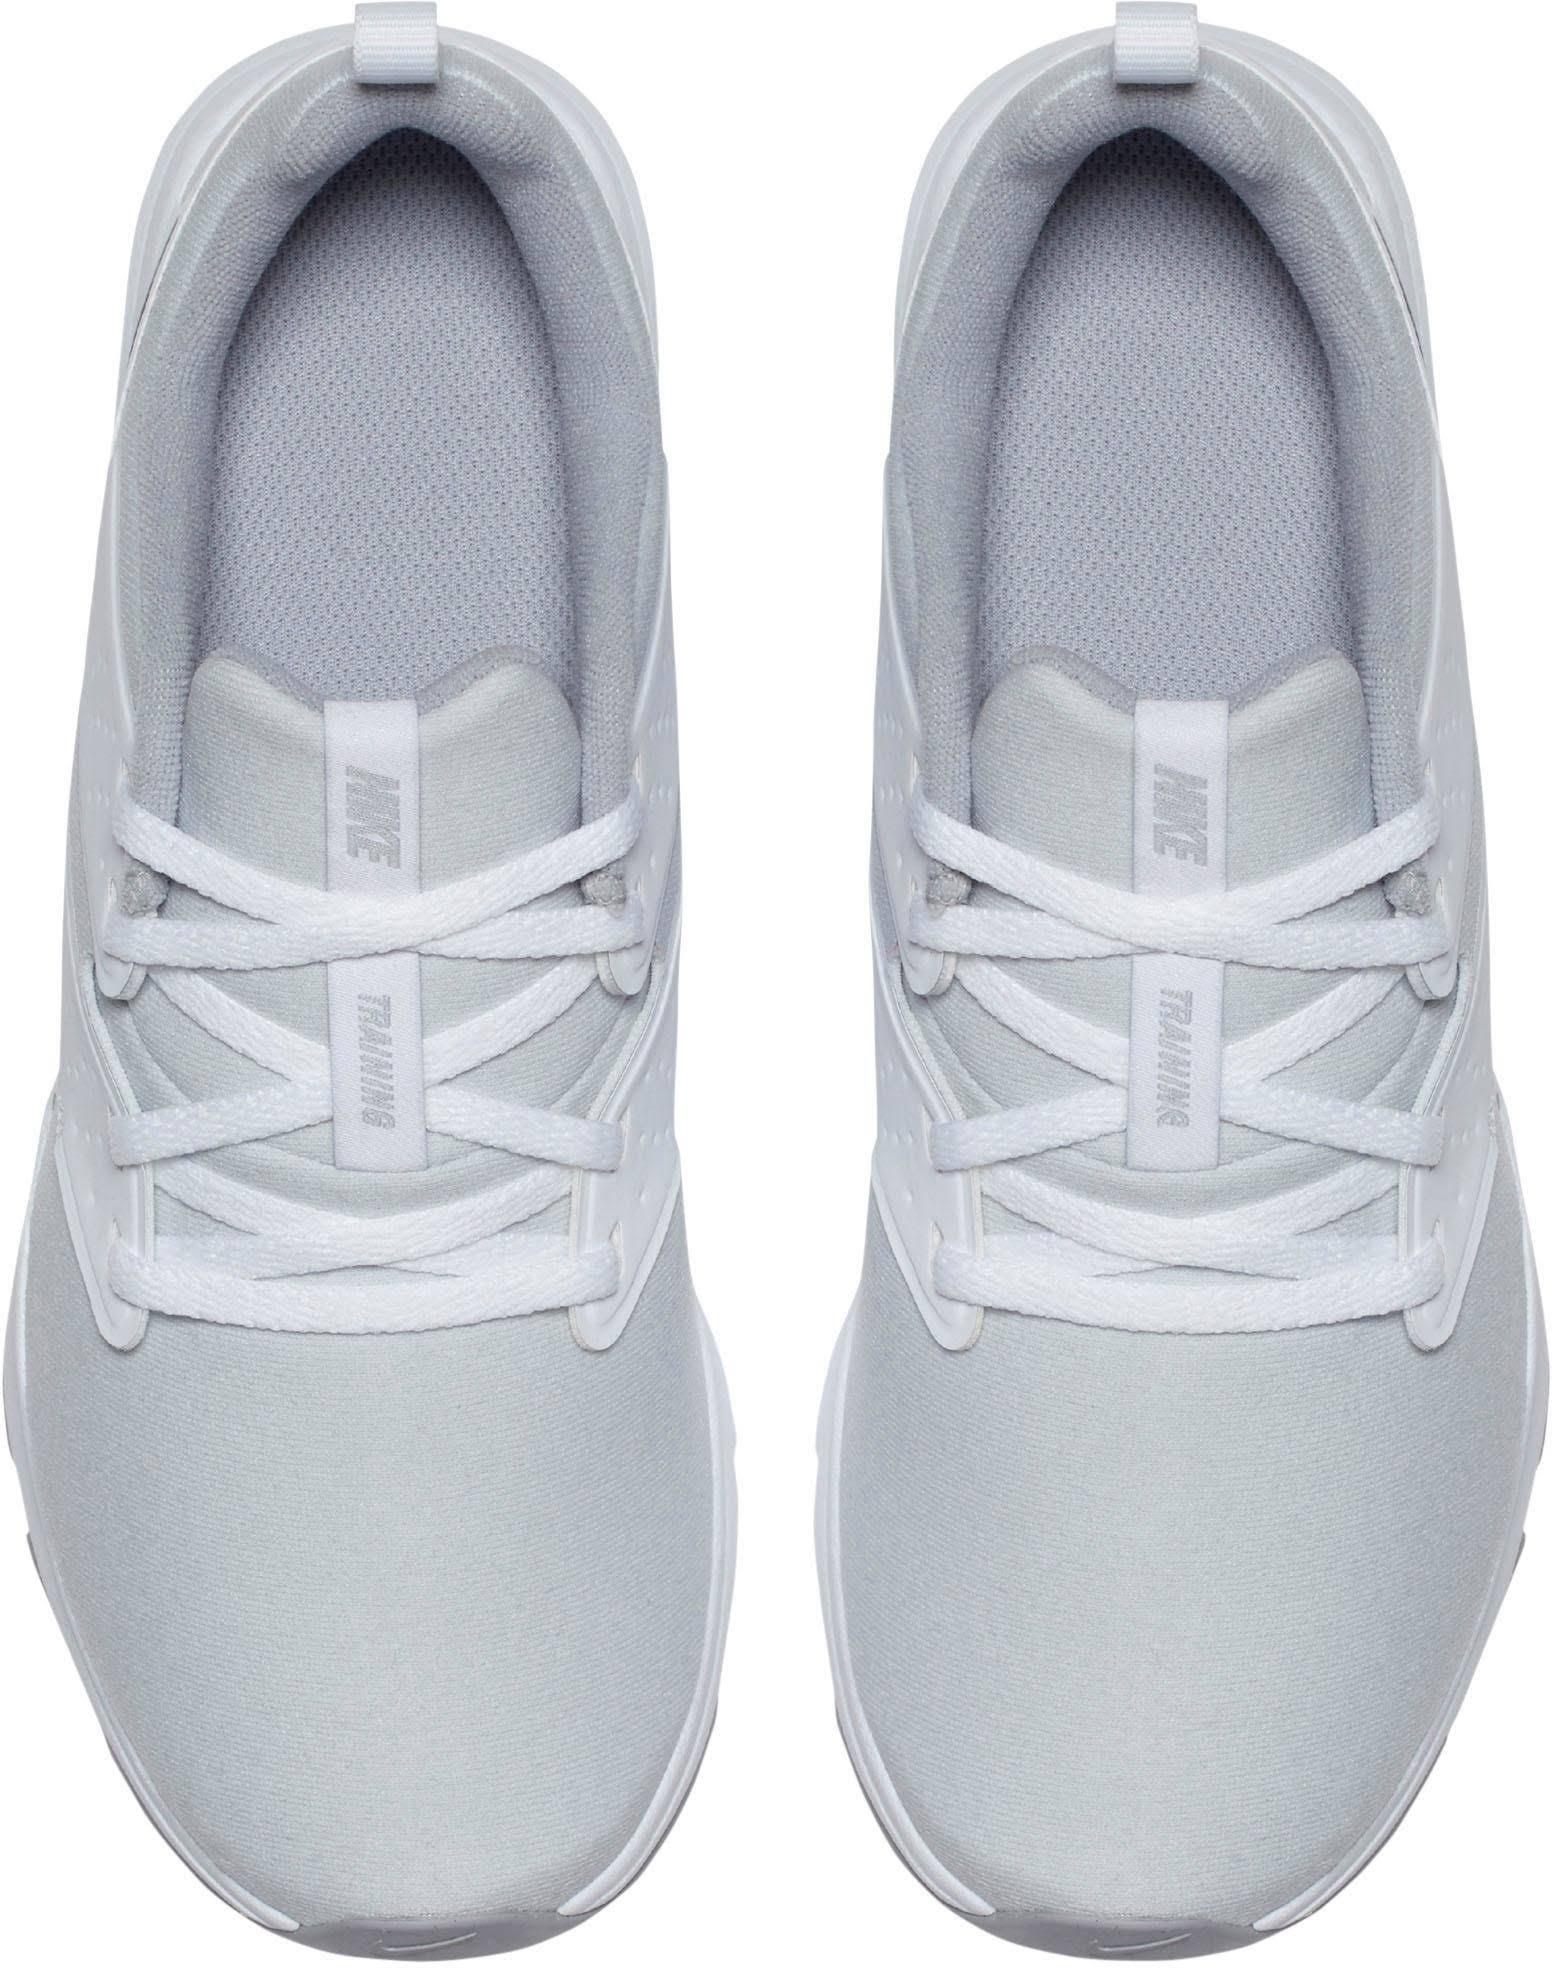 In Wmns 36 Grijs 2 Air Tr Beschikbaar Nike 1 Bella Sportschoenen g80w0